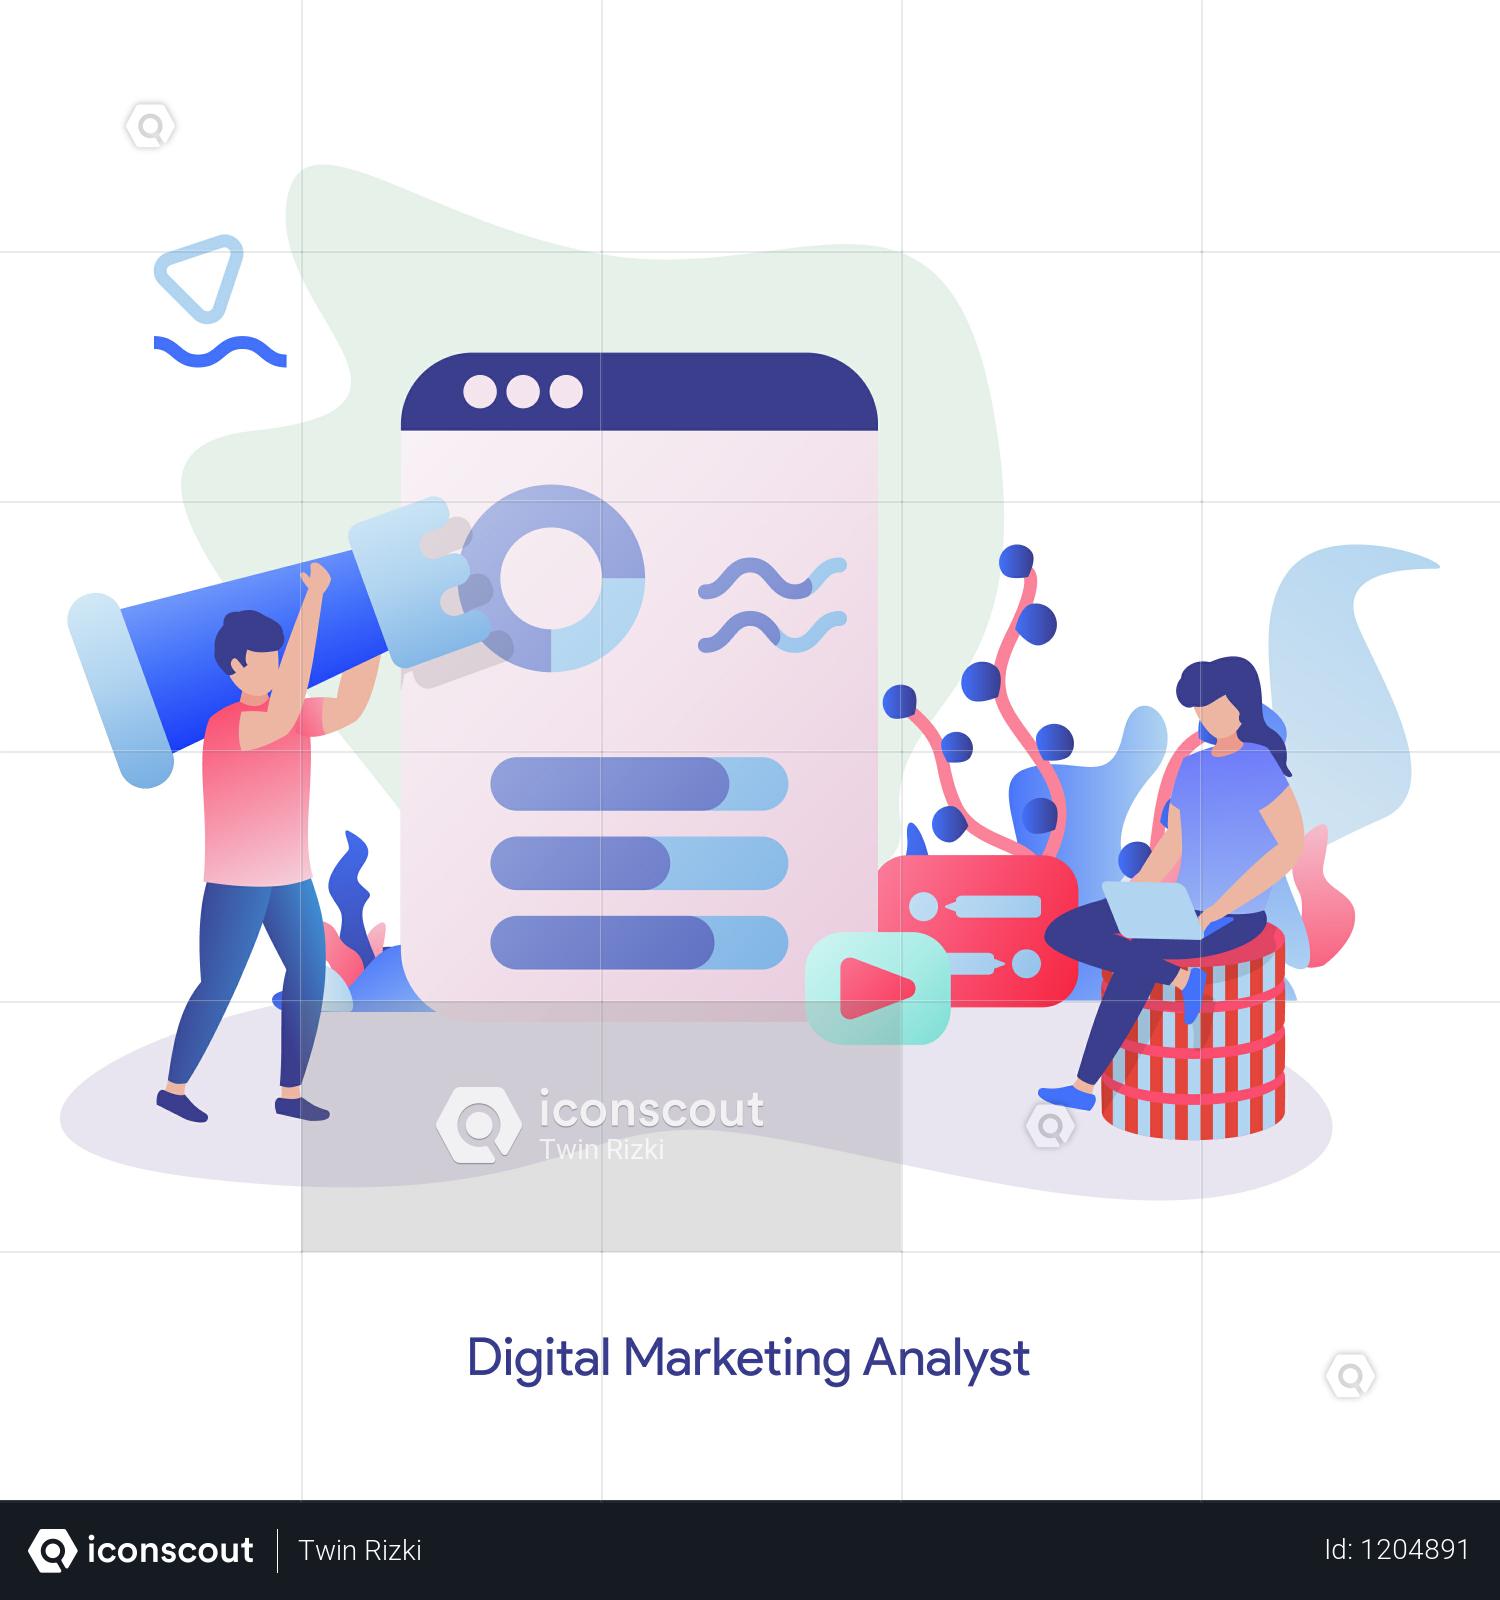 Premium Digital Marketing Analyst Illustration Download In Png Vector Format Digital Marketing Infographic Marketing Online Marketing Infographic